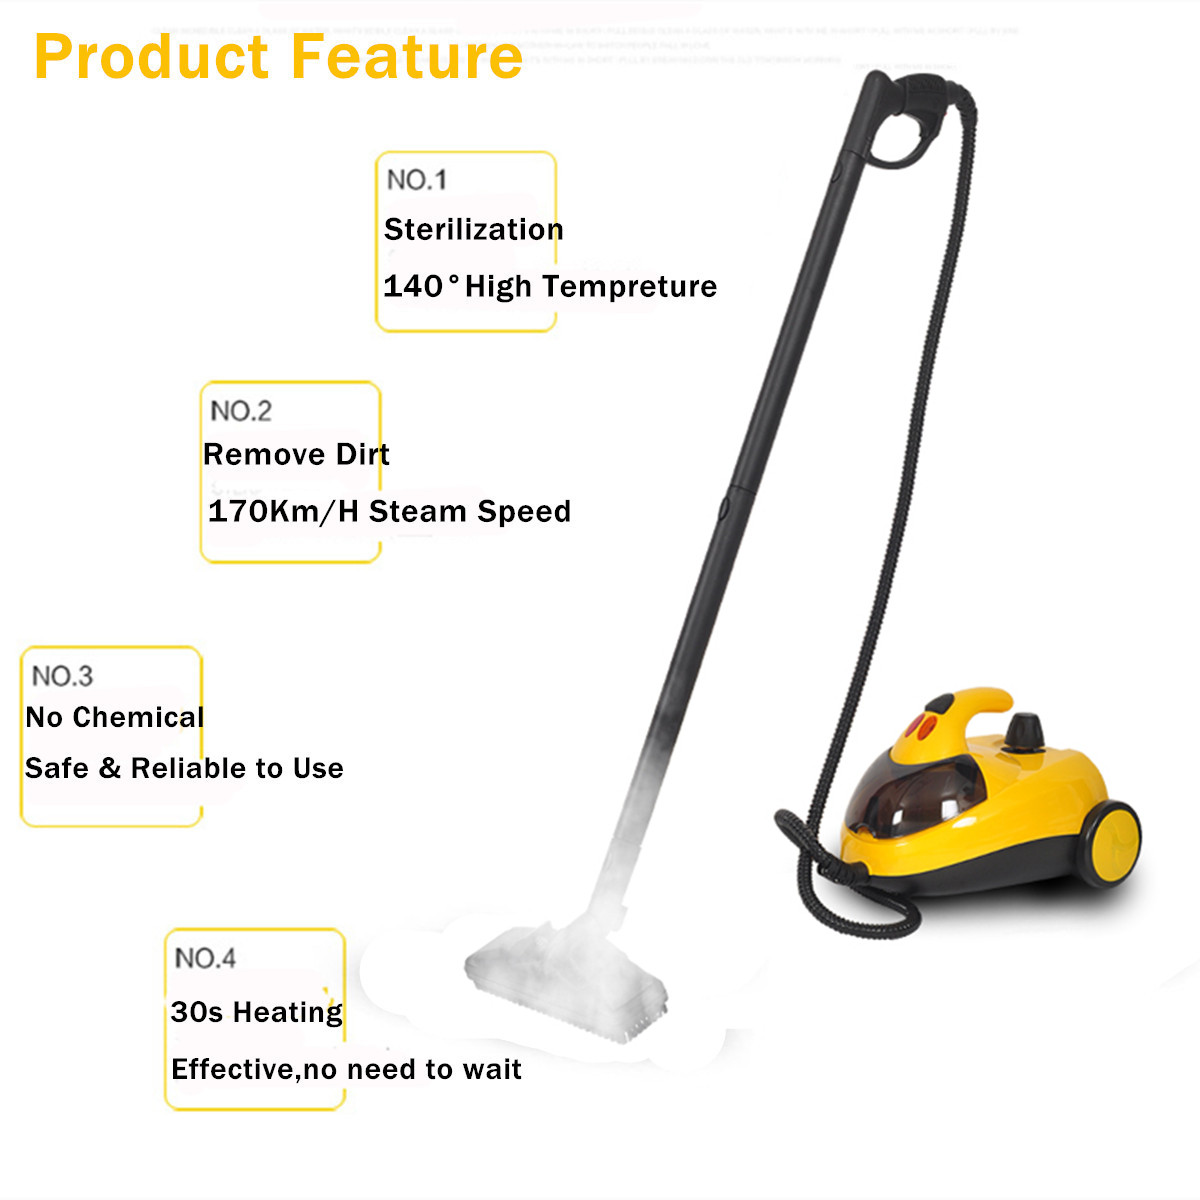 13in1 High Pressure Steam 2000W AU220V 1.5L4.0 Bar Floor Carpet Cleaner Washer Cleaning Machine 360 Wheel for Clean Bathroom Car